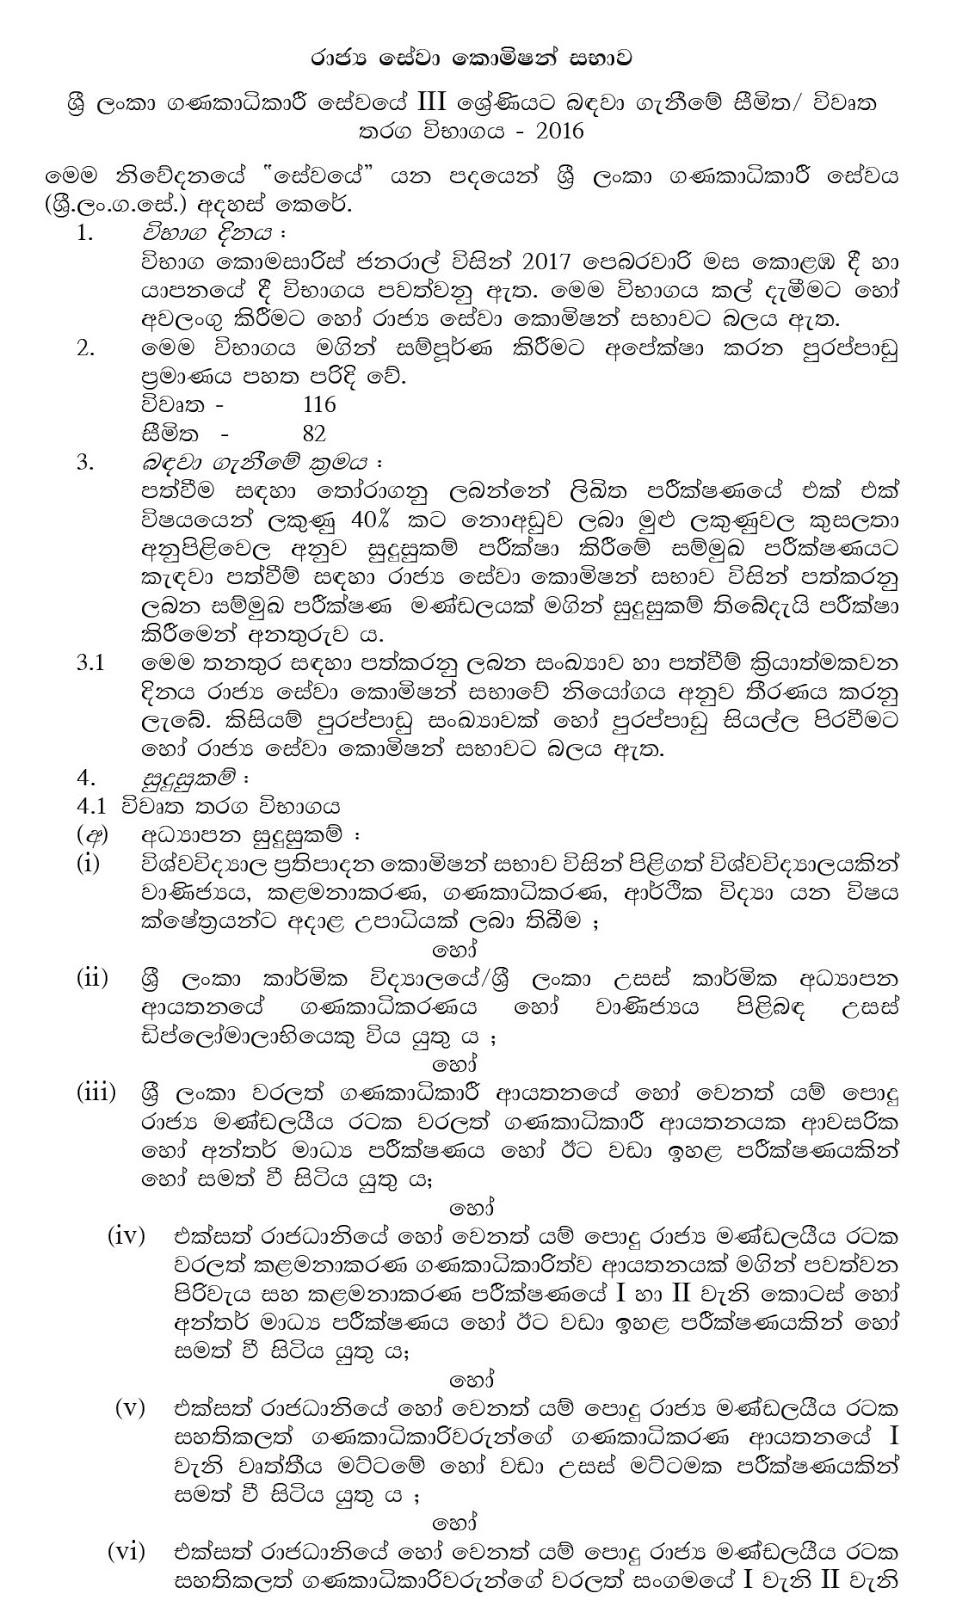 sri lankan accountant service exam application com sri lankan accountant service exam application 2016